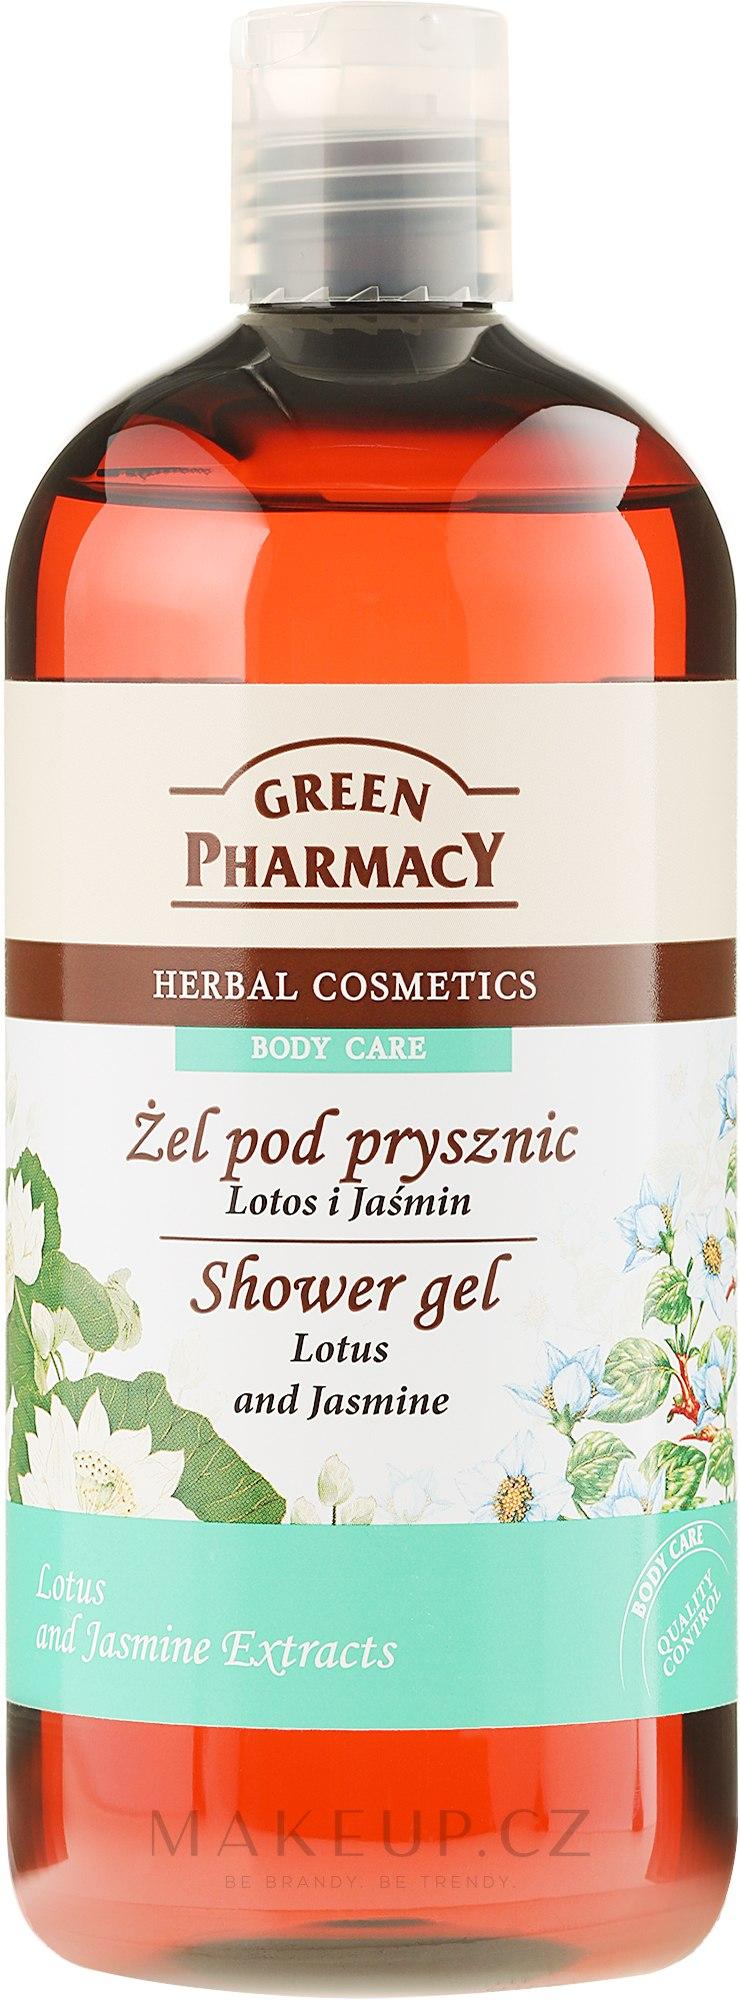 Sprchový gel Lotos a jasmín - Green Pharmacy Shower Gel Lotus and Jasmine — foto 500 ml